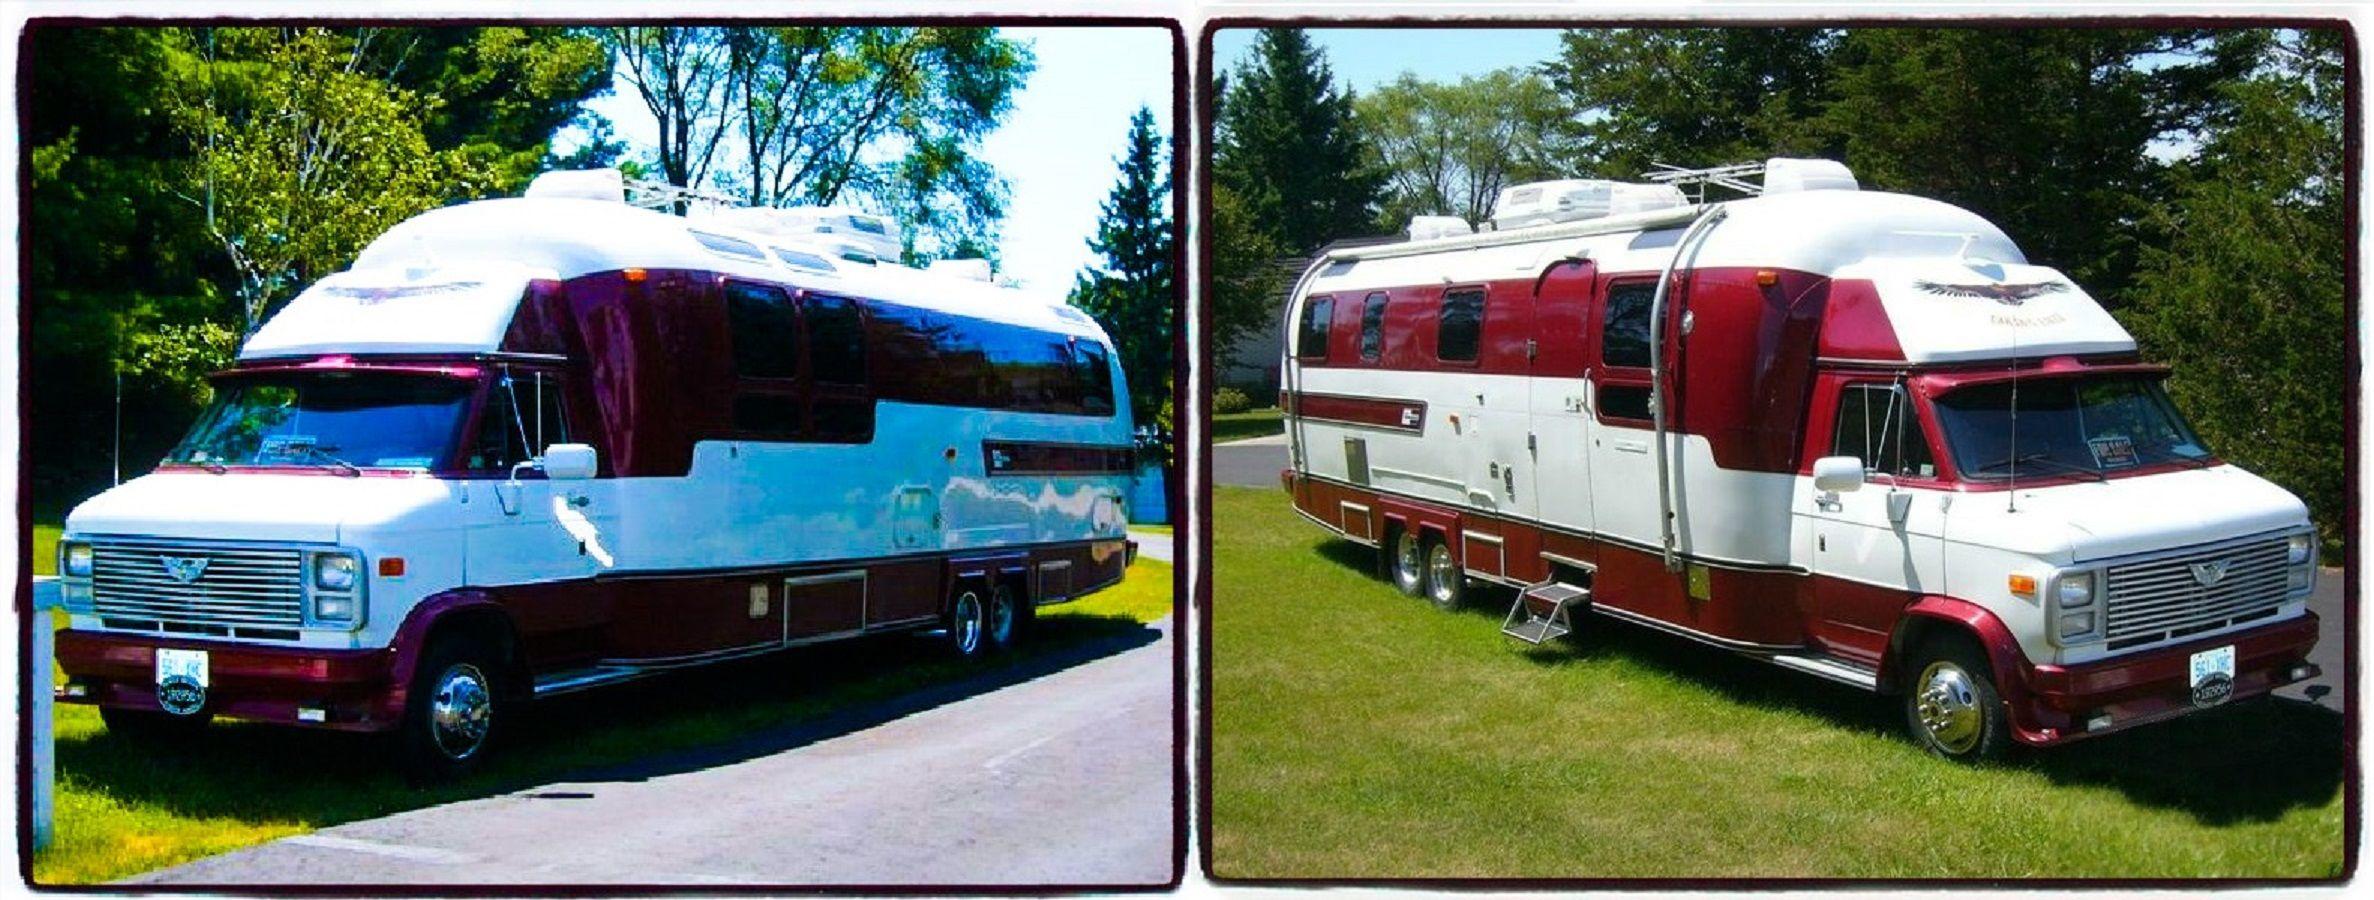 Vintage Airstream Motorhome Rvoccouk Forum